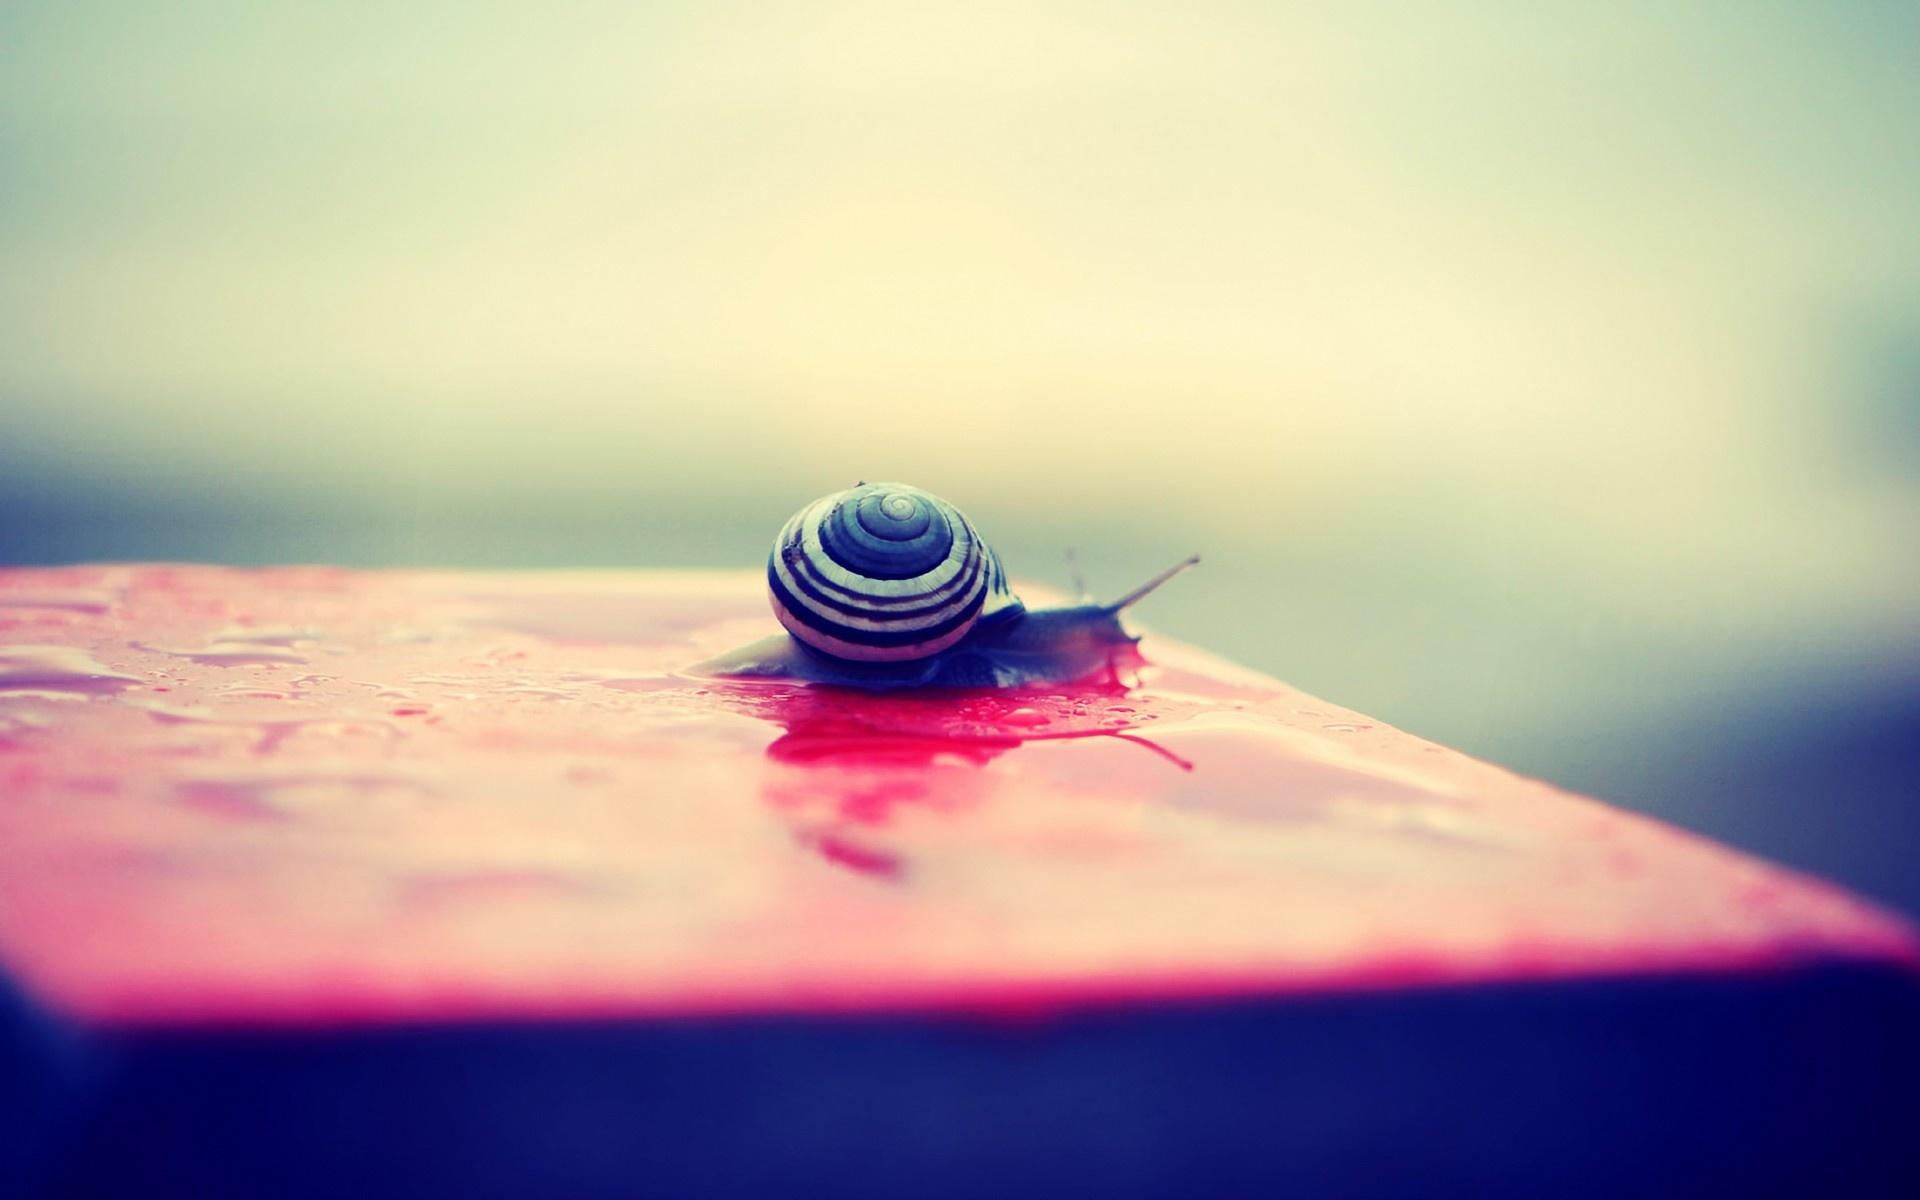 cool snail wallpaper 35683